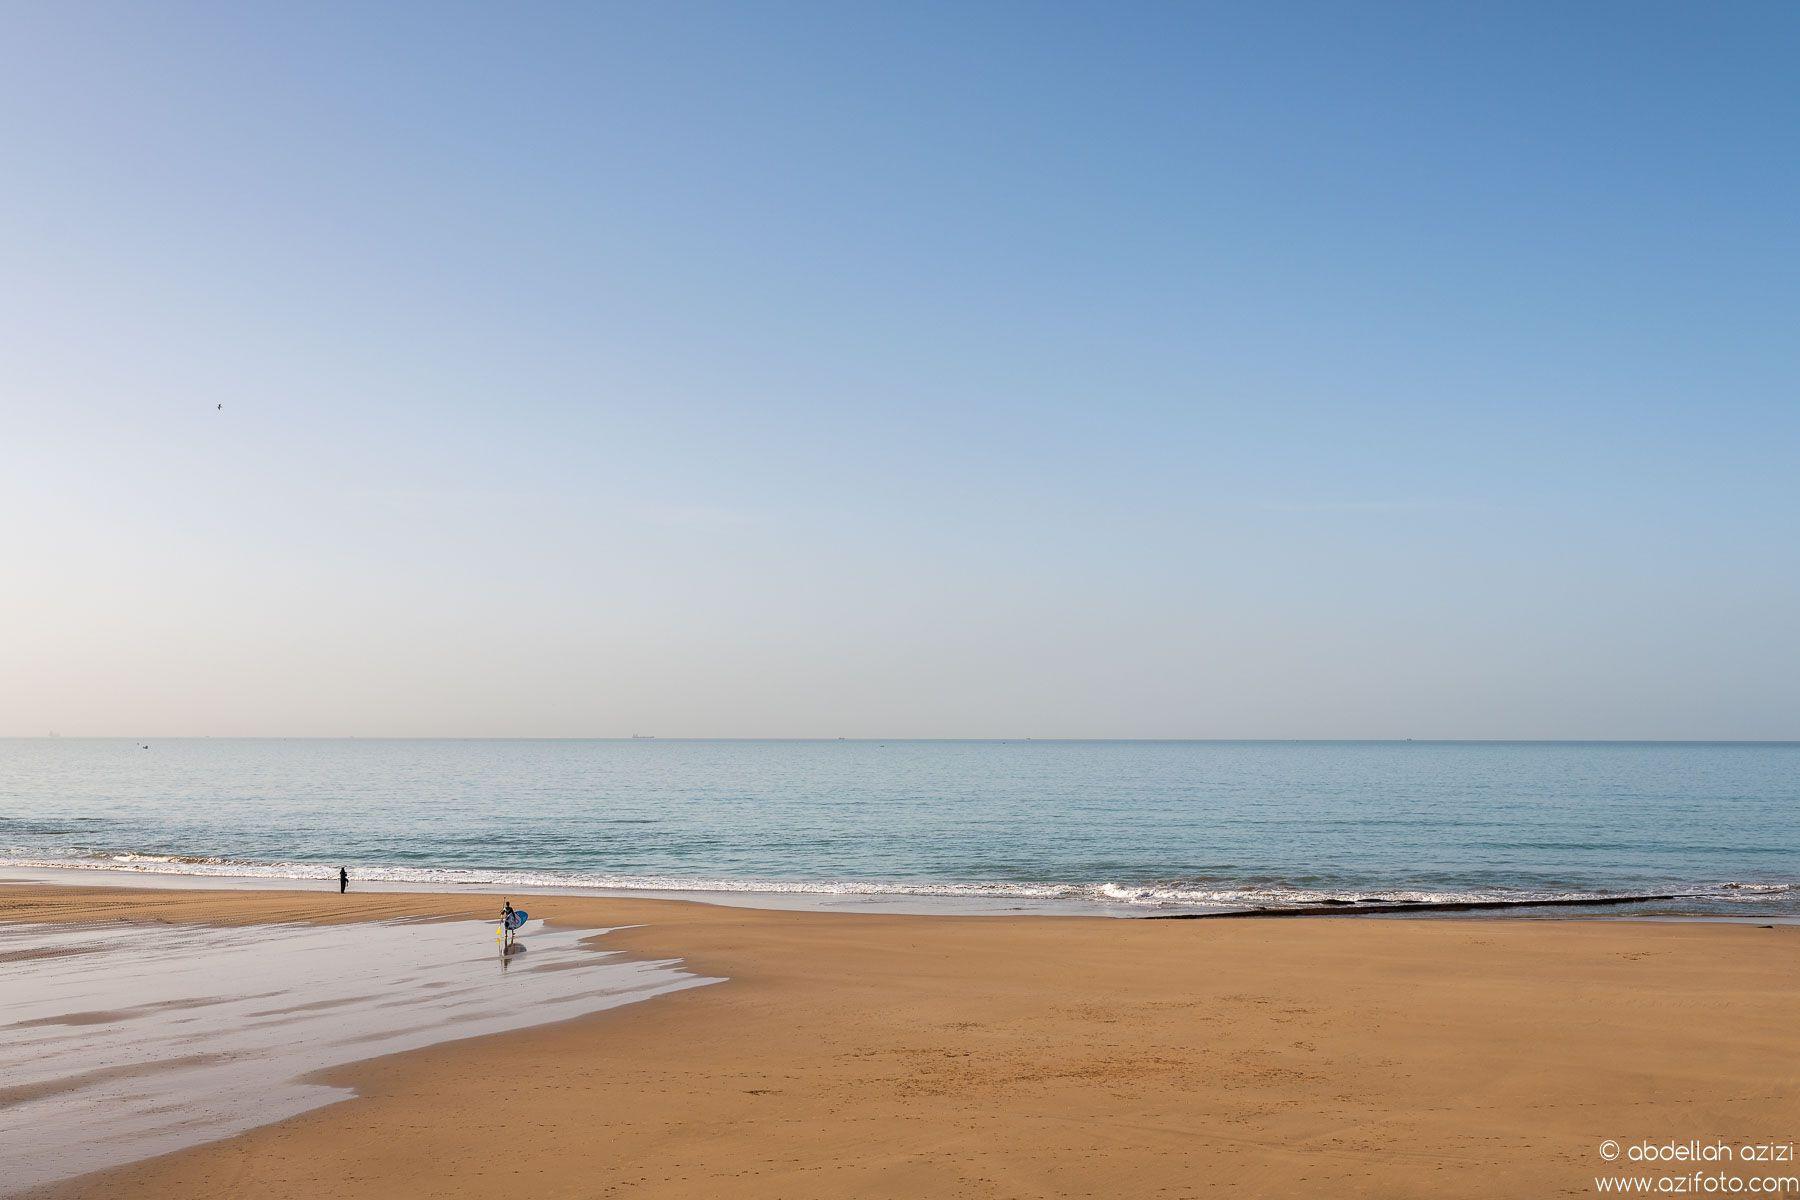 Taghazout beach, Morocco